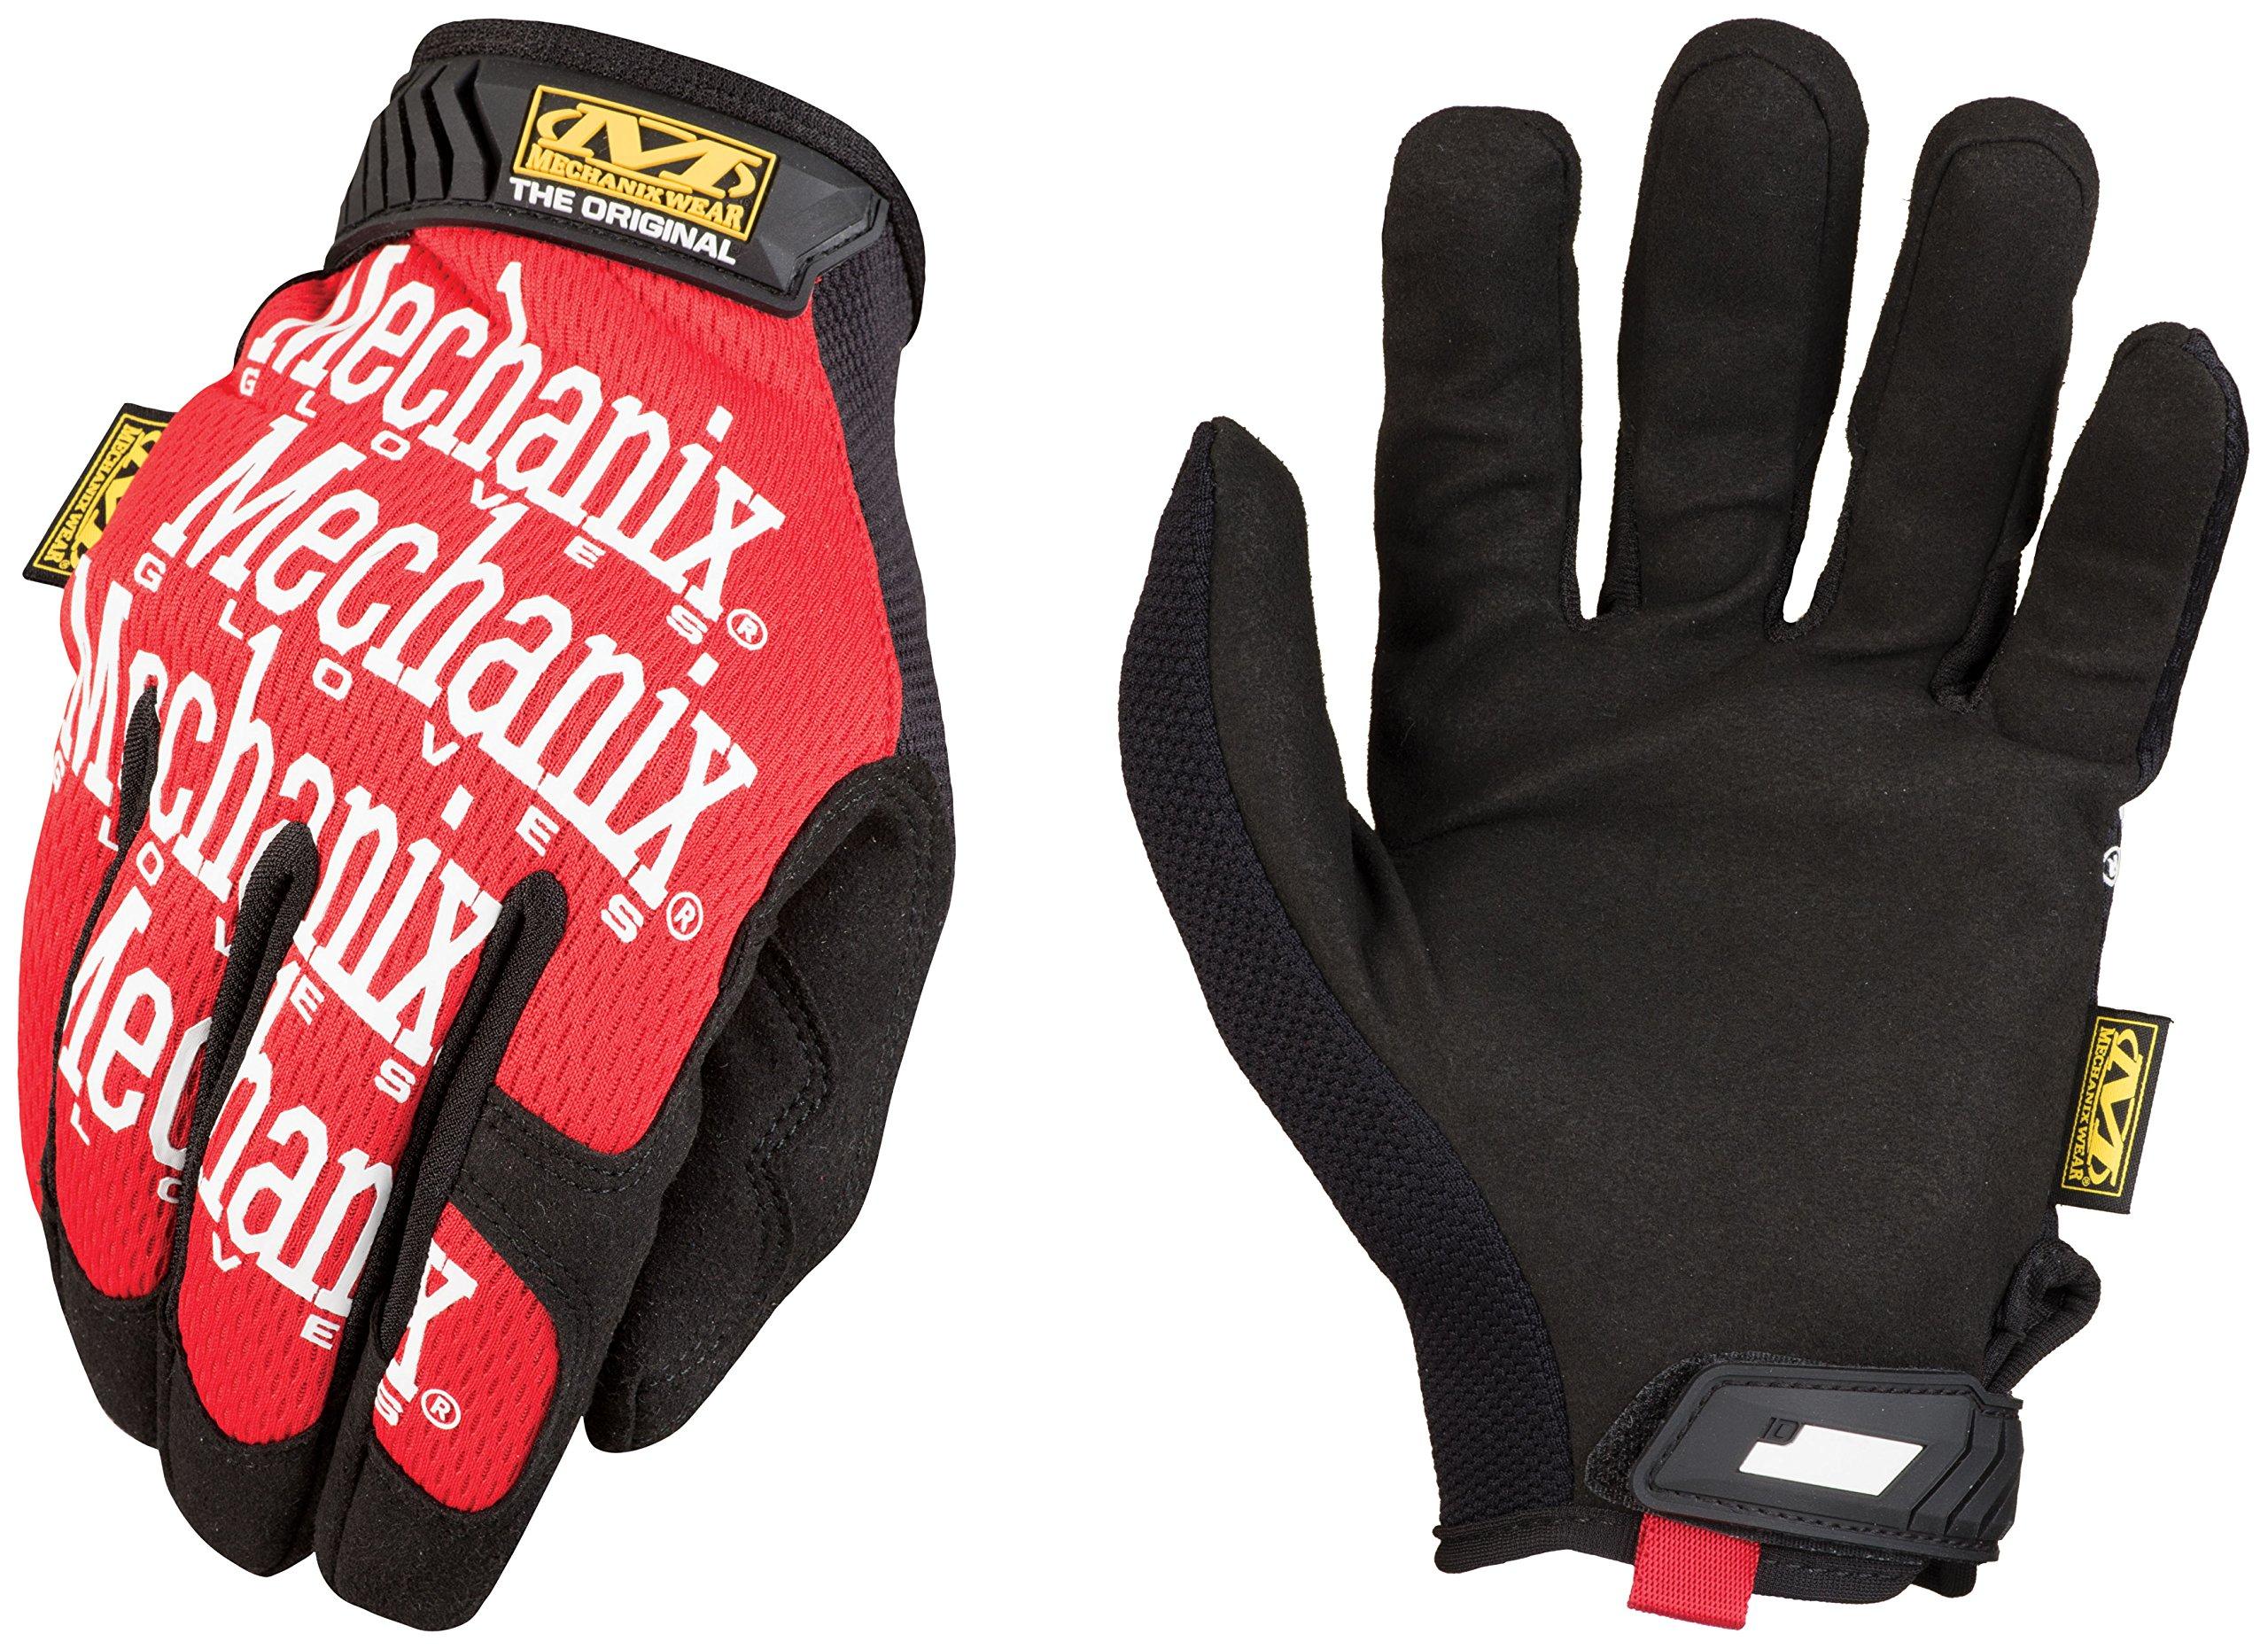 Mechanix Wear - Original Gloves (Medium, Red)